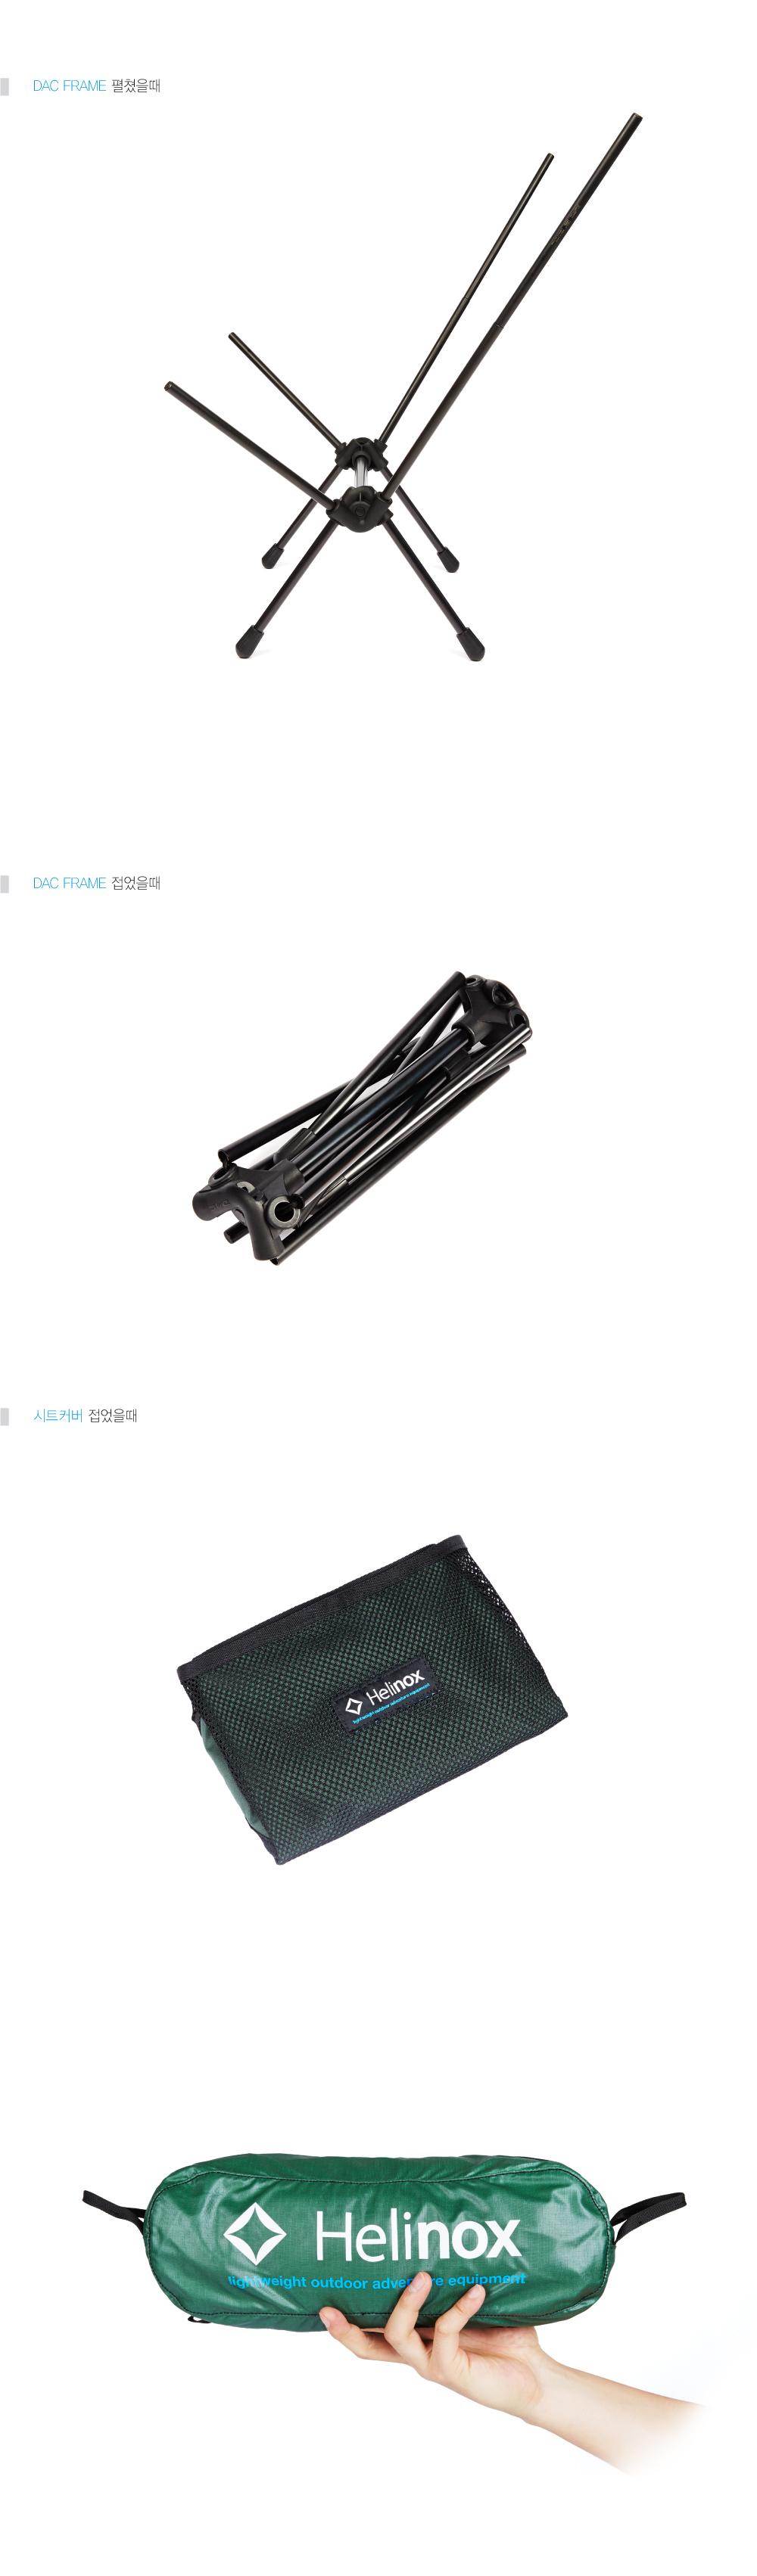 20140303-Helinox_chair-one_green상품페이지2.jpg